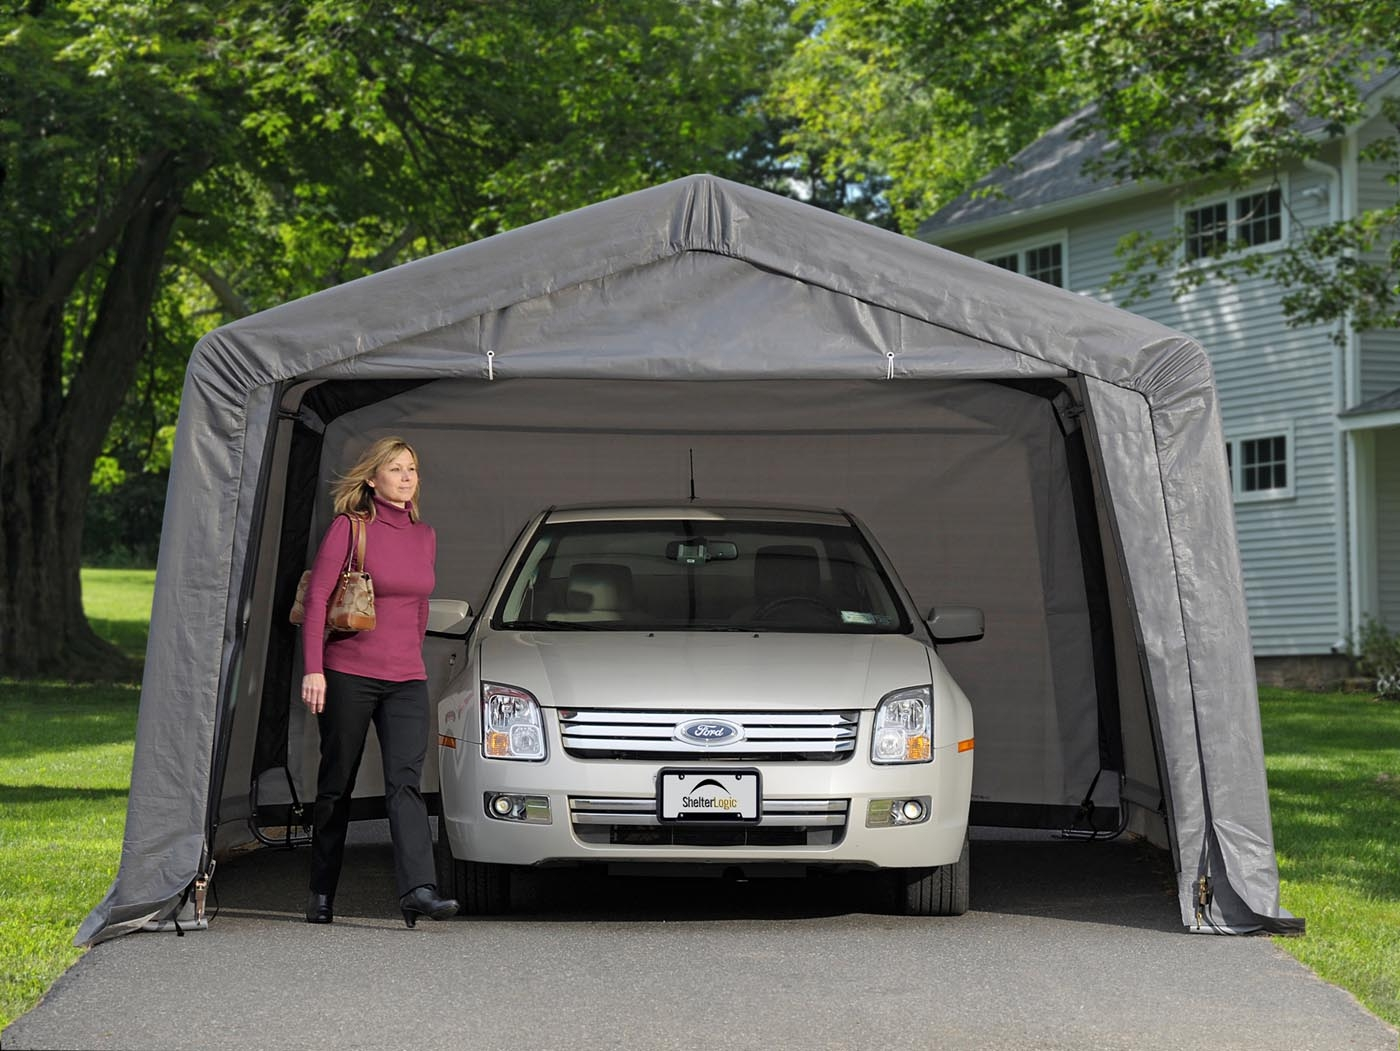 Garage démontable voiture ShelterLogic promo